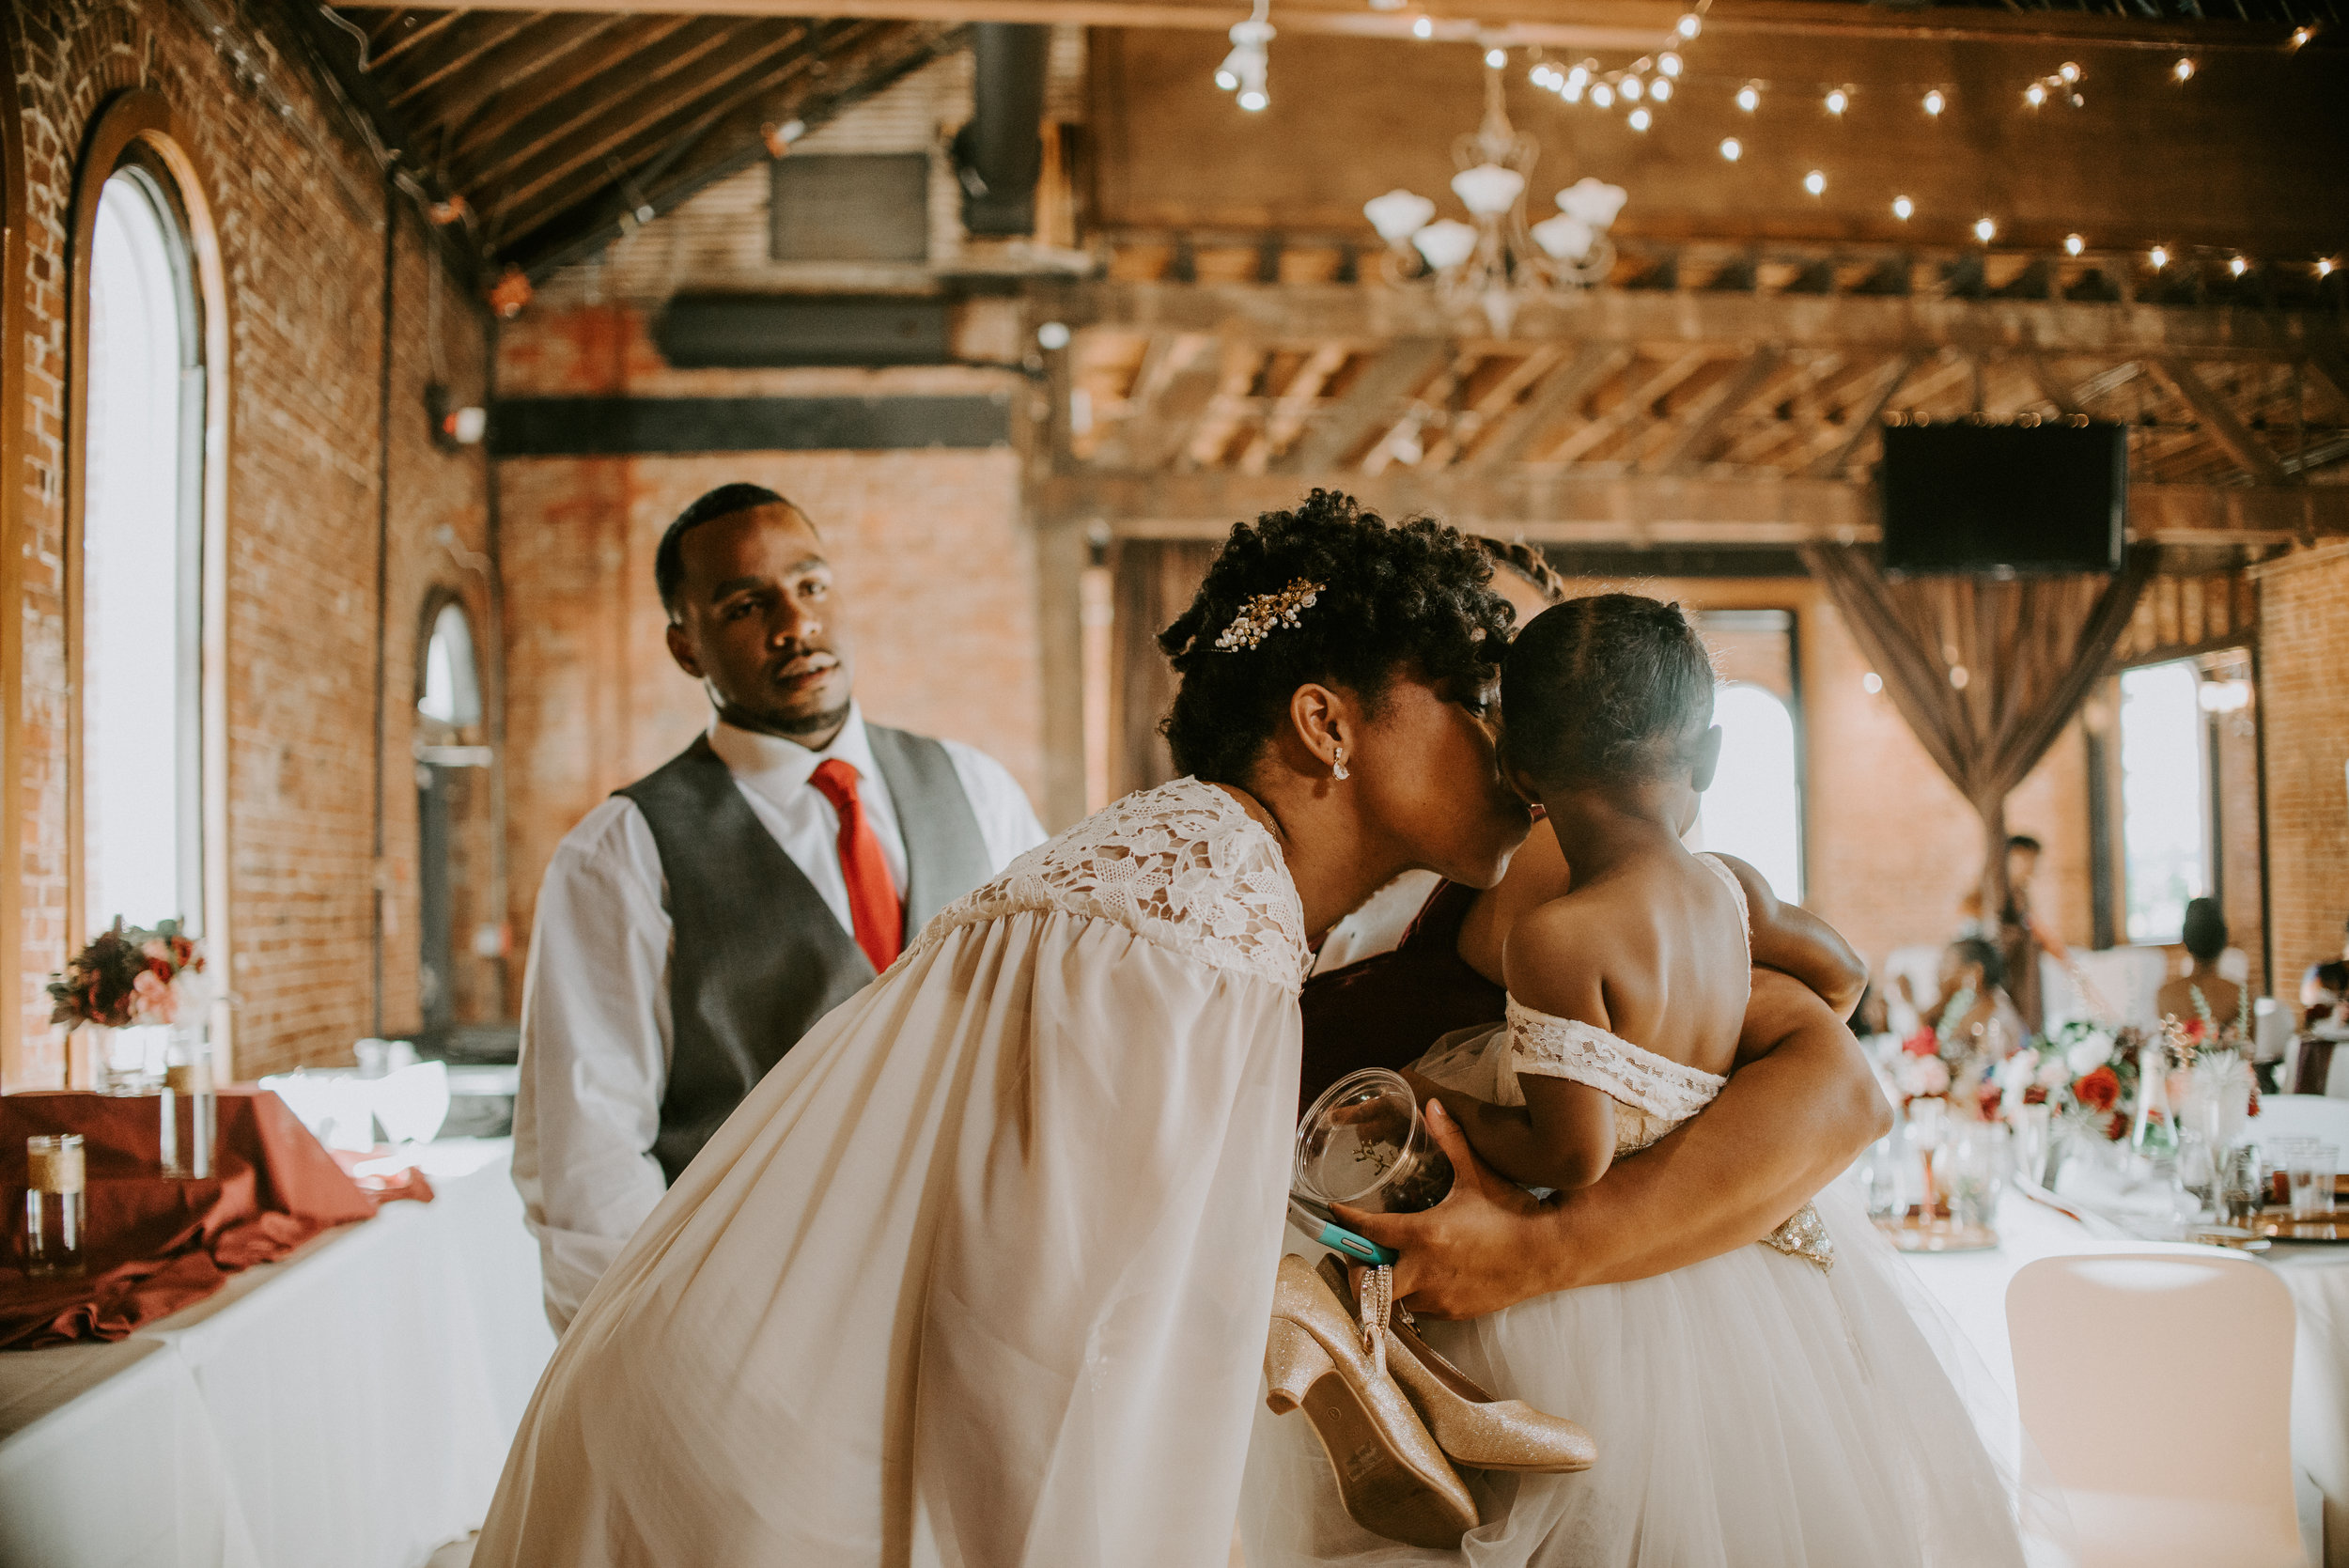 WonderlyCreative_Wedding_6.7.18_Khara&Dwayne_-940.jpg